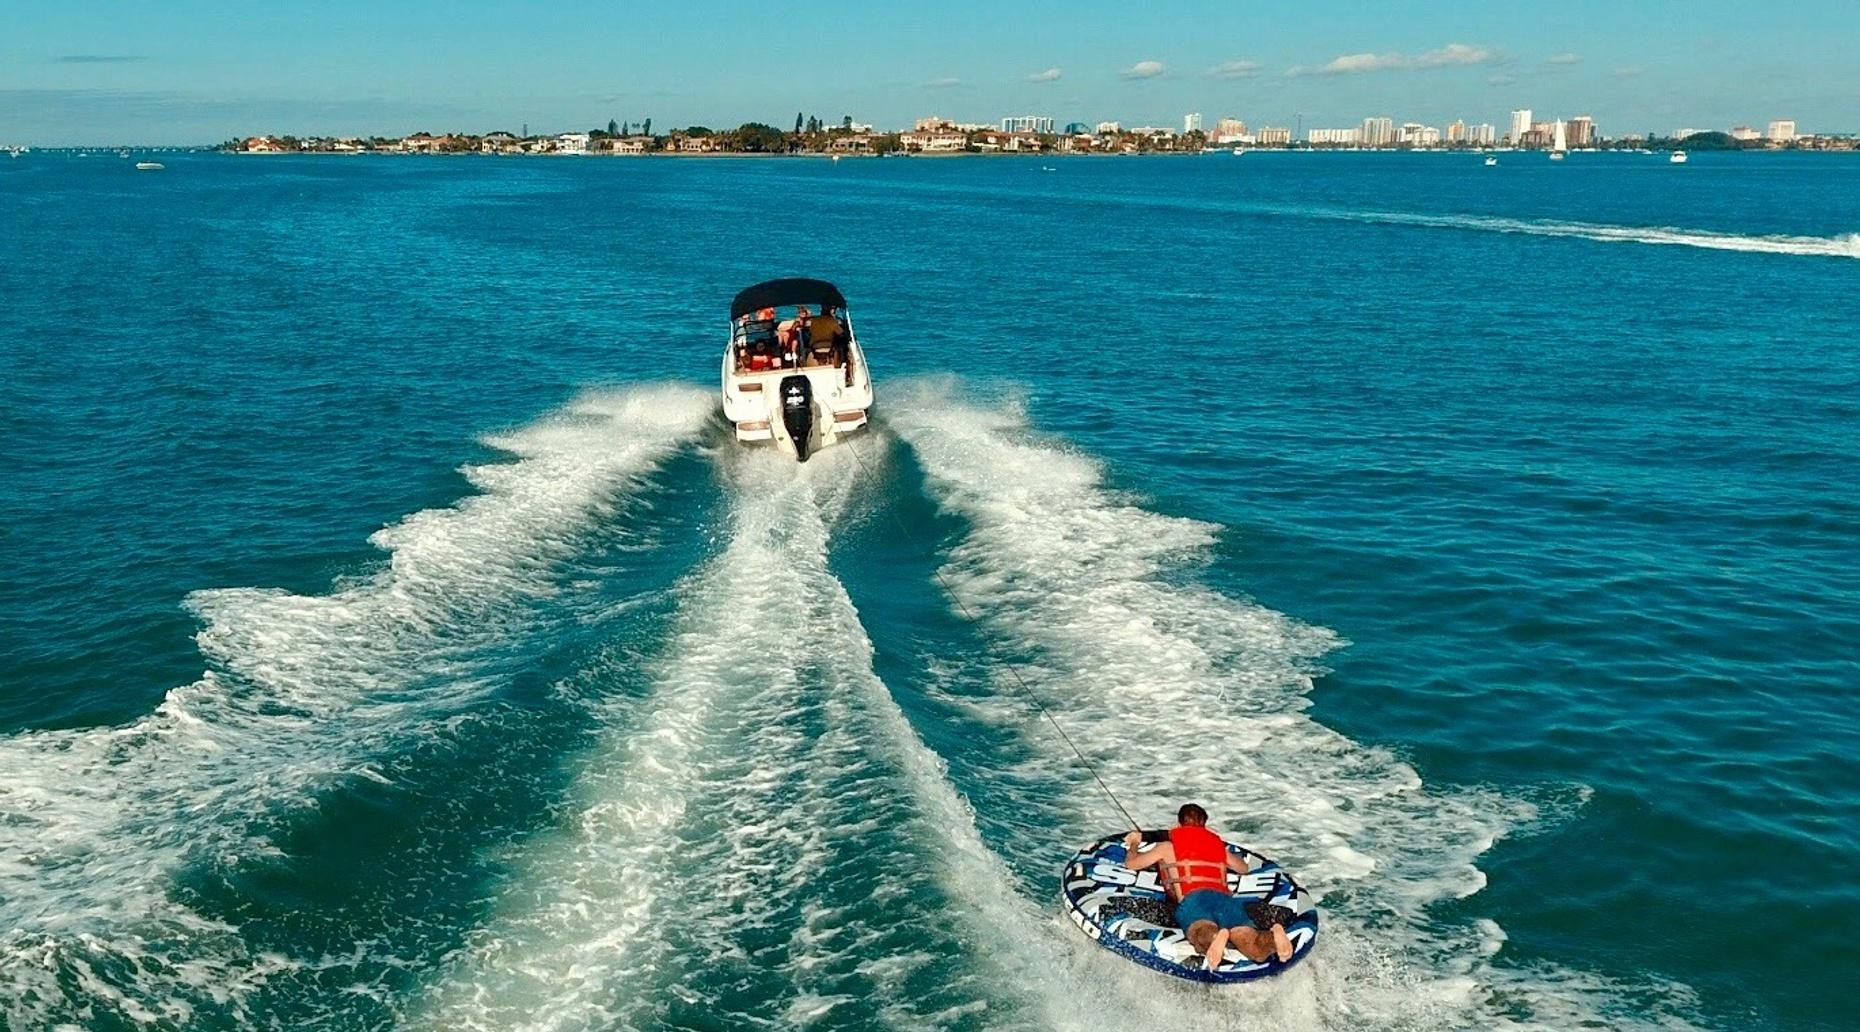 4-Hour Sandbar Cruise in Sarasota